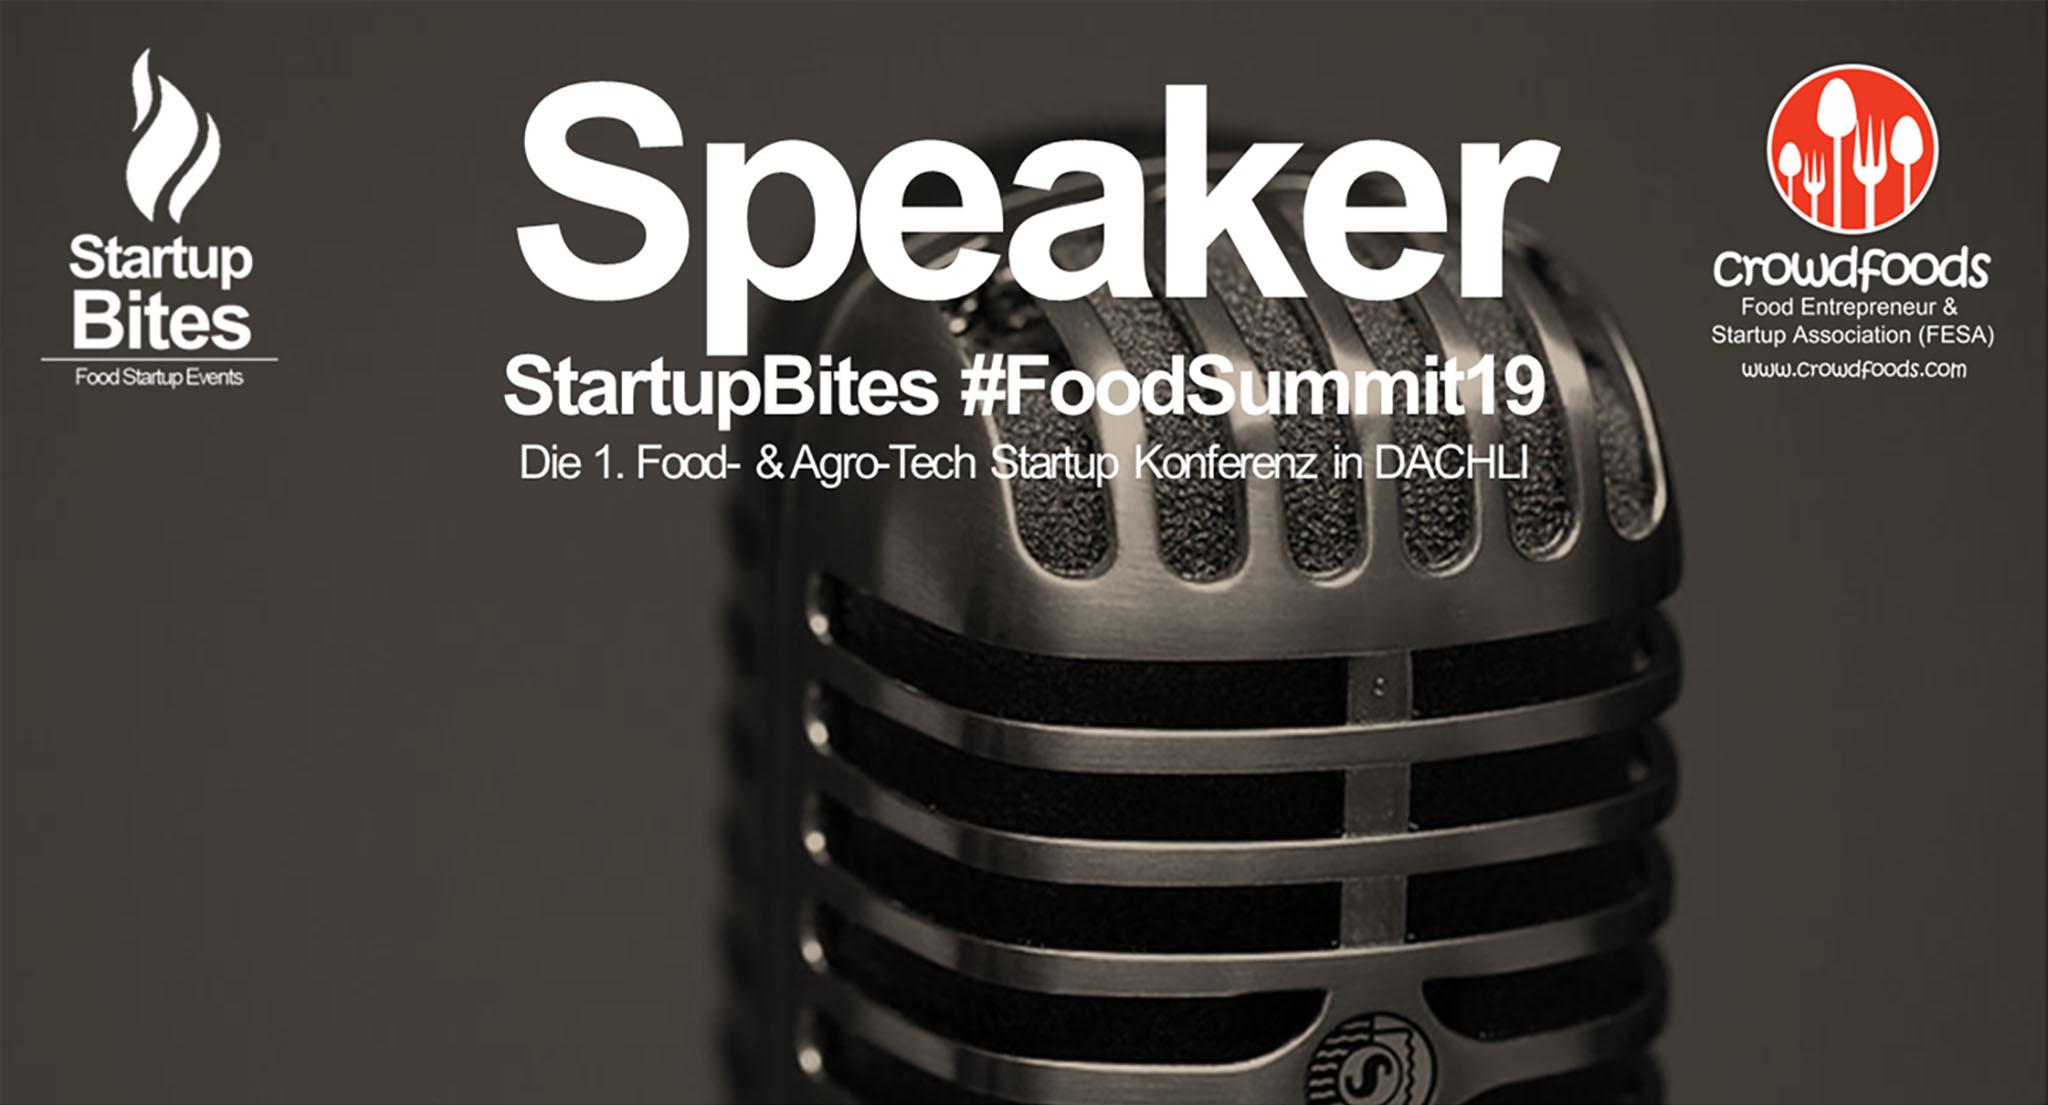 Speaker StartupBites #FoodSummit19